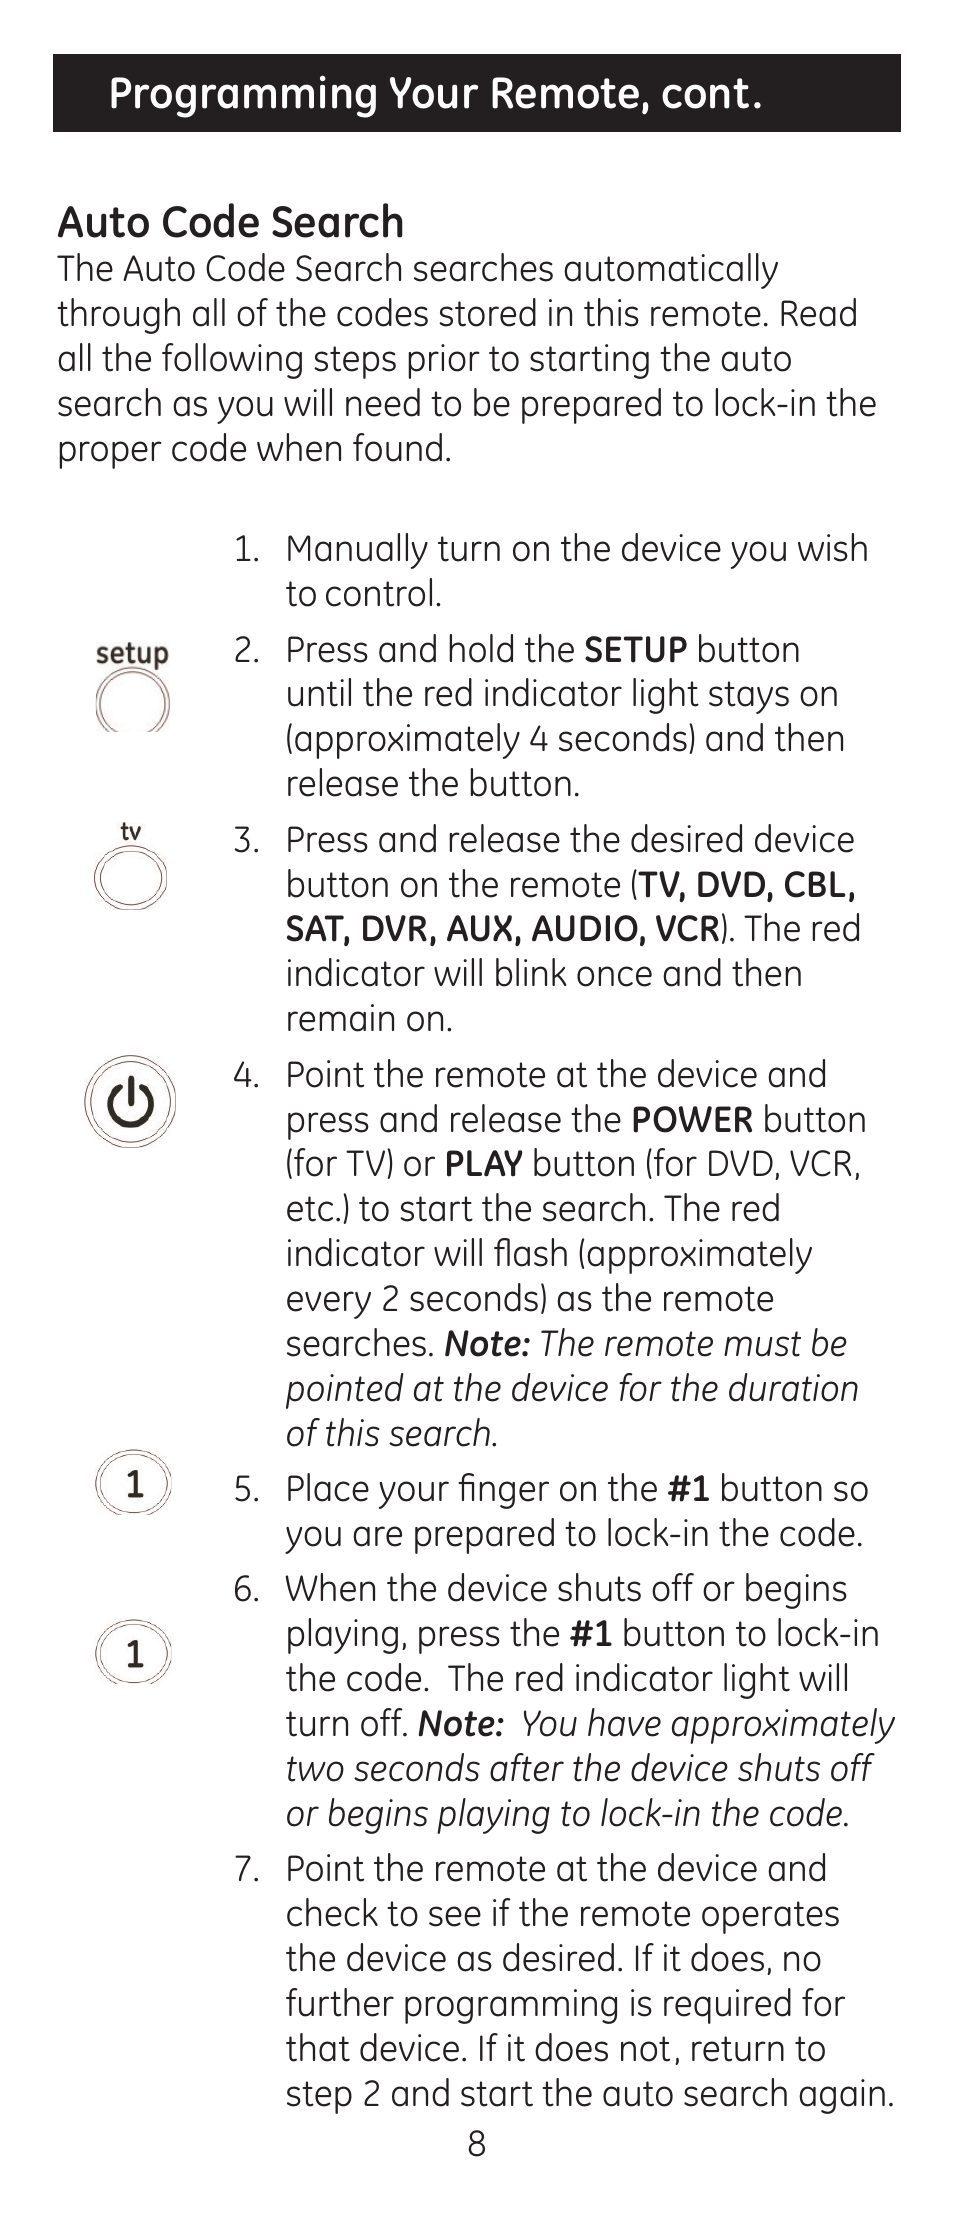 Programming your remote, cont. auto code search | GE 24944 ...